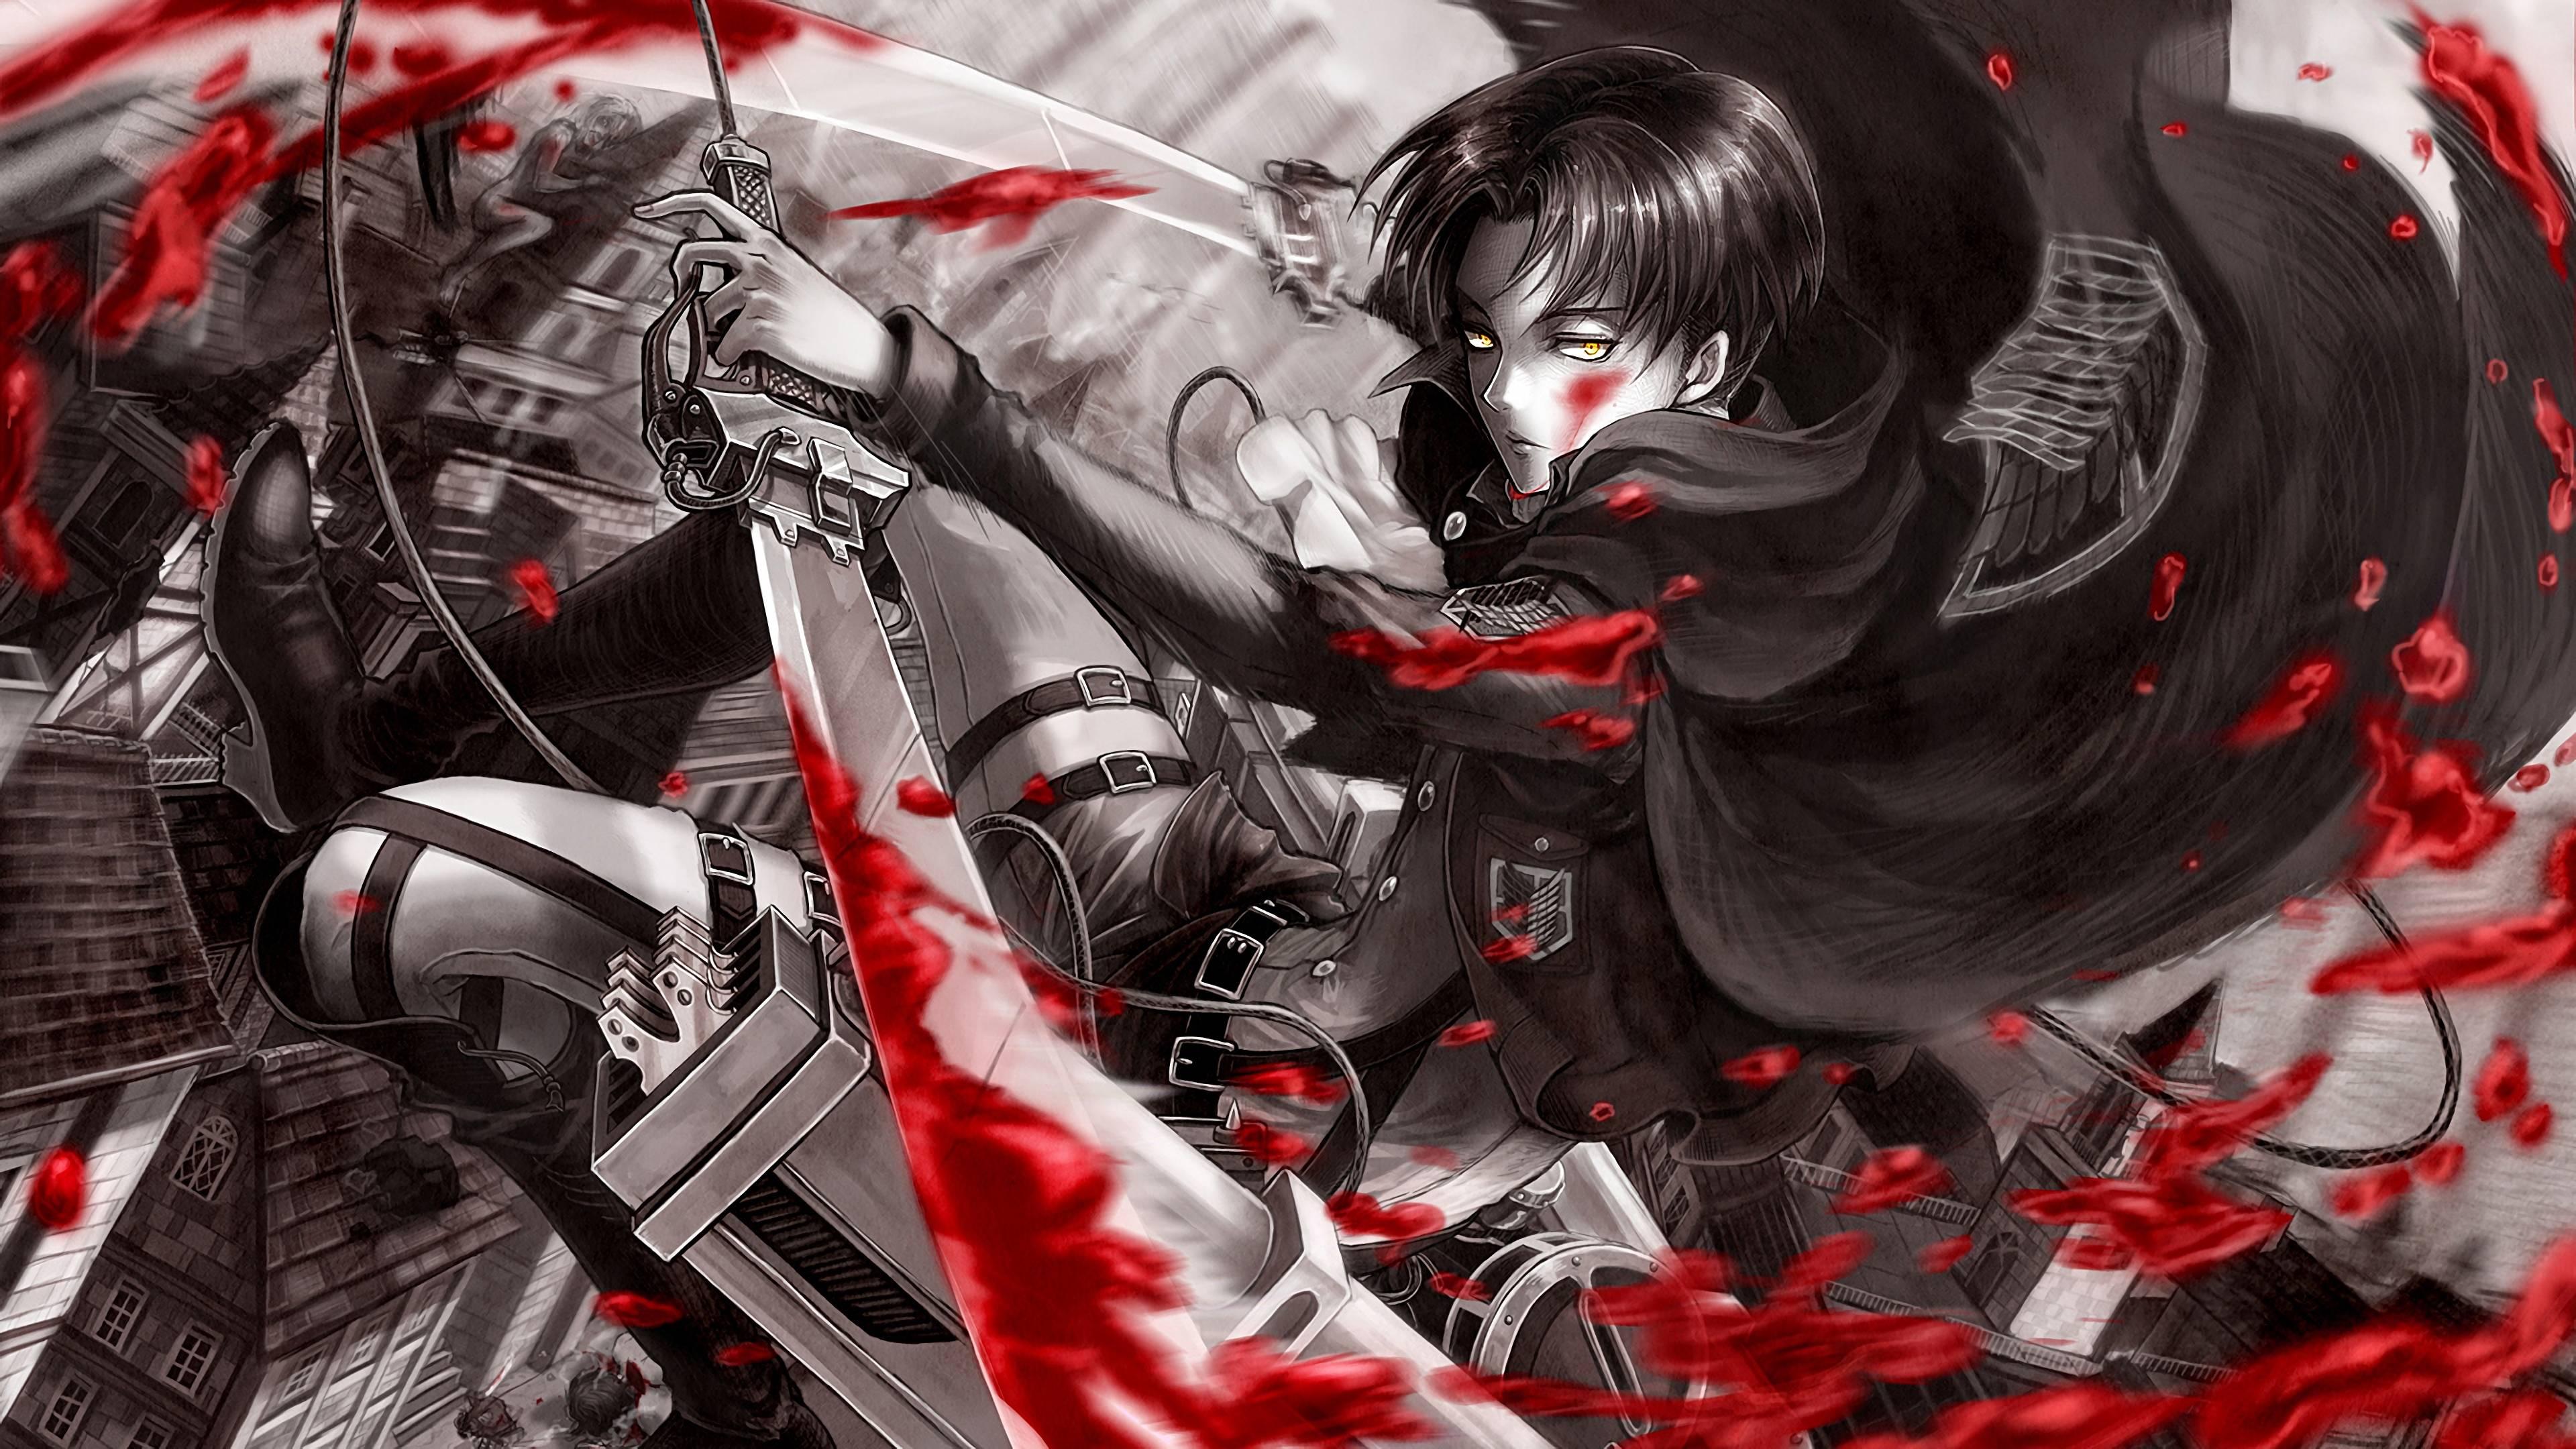 Hajime isayama, kodansha/''attack on titan'' production committee attack on titan has taken the anime world by storm. Attack On Titans Season 4 Wallpapers - Wallpaper Cave